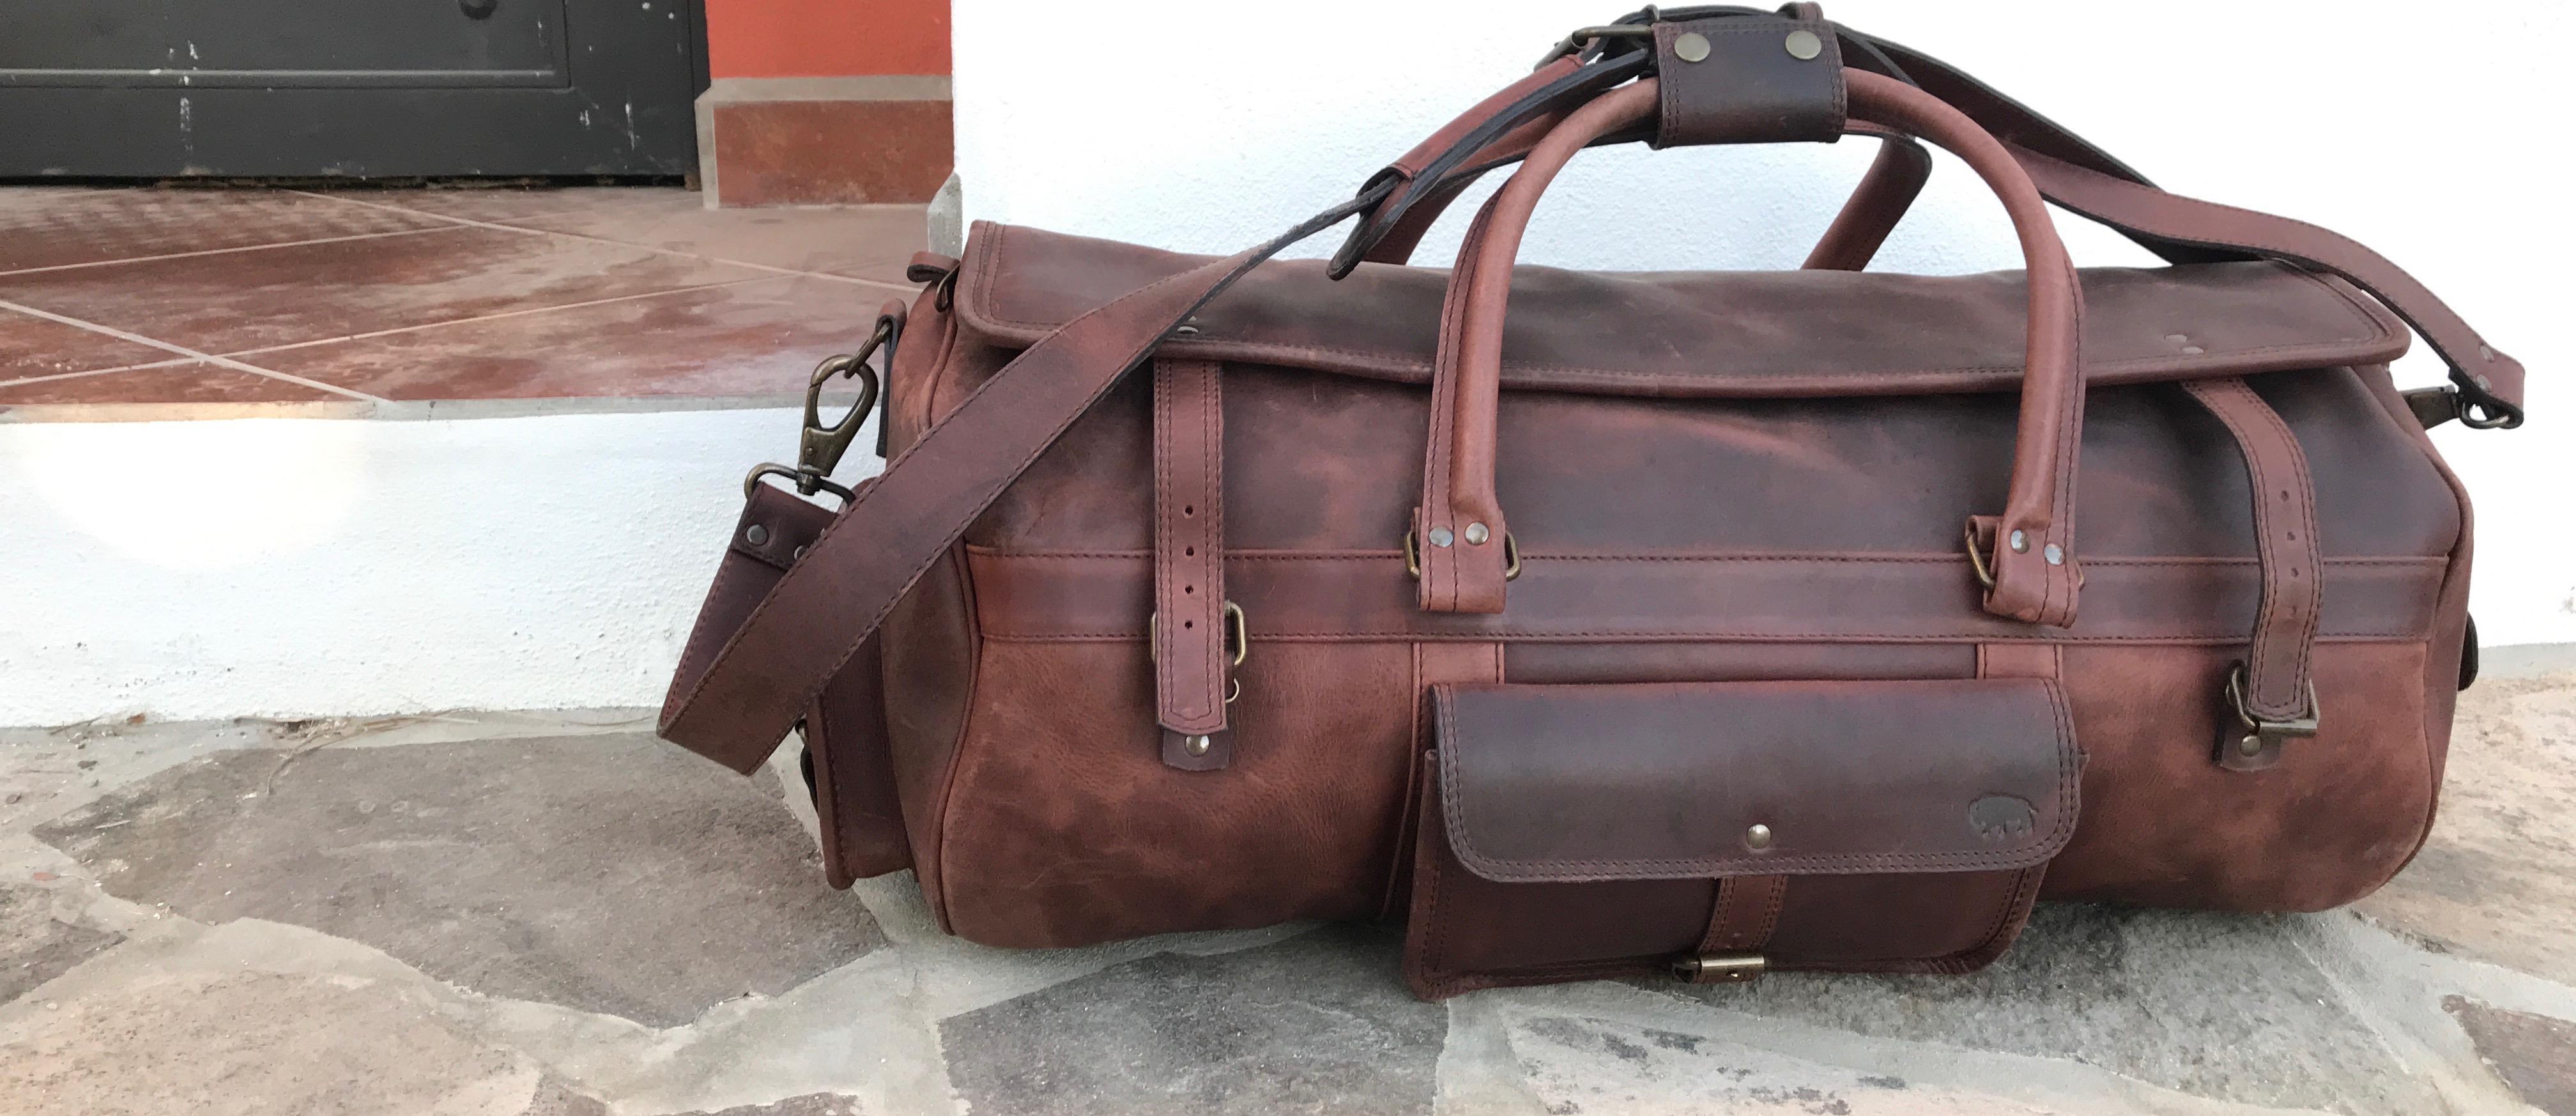 1b0c09fc4c THE ROOSEVELT BUFFALO LEATHER TRAVEL DUFFLE BAG